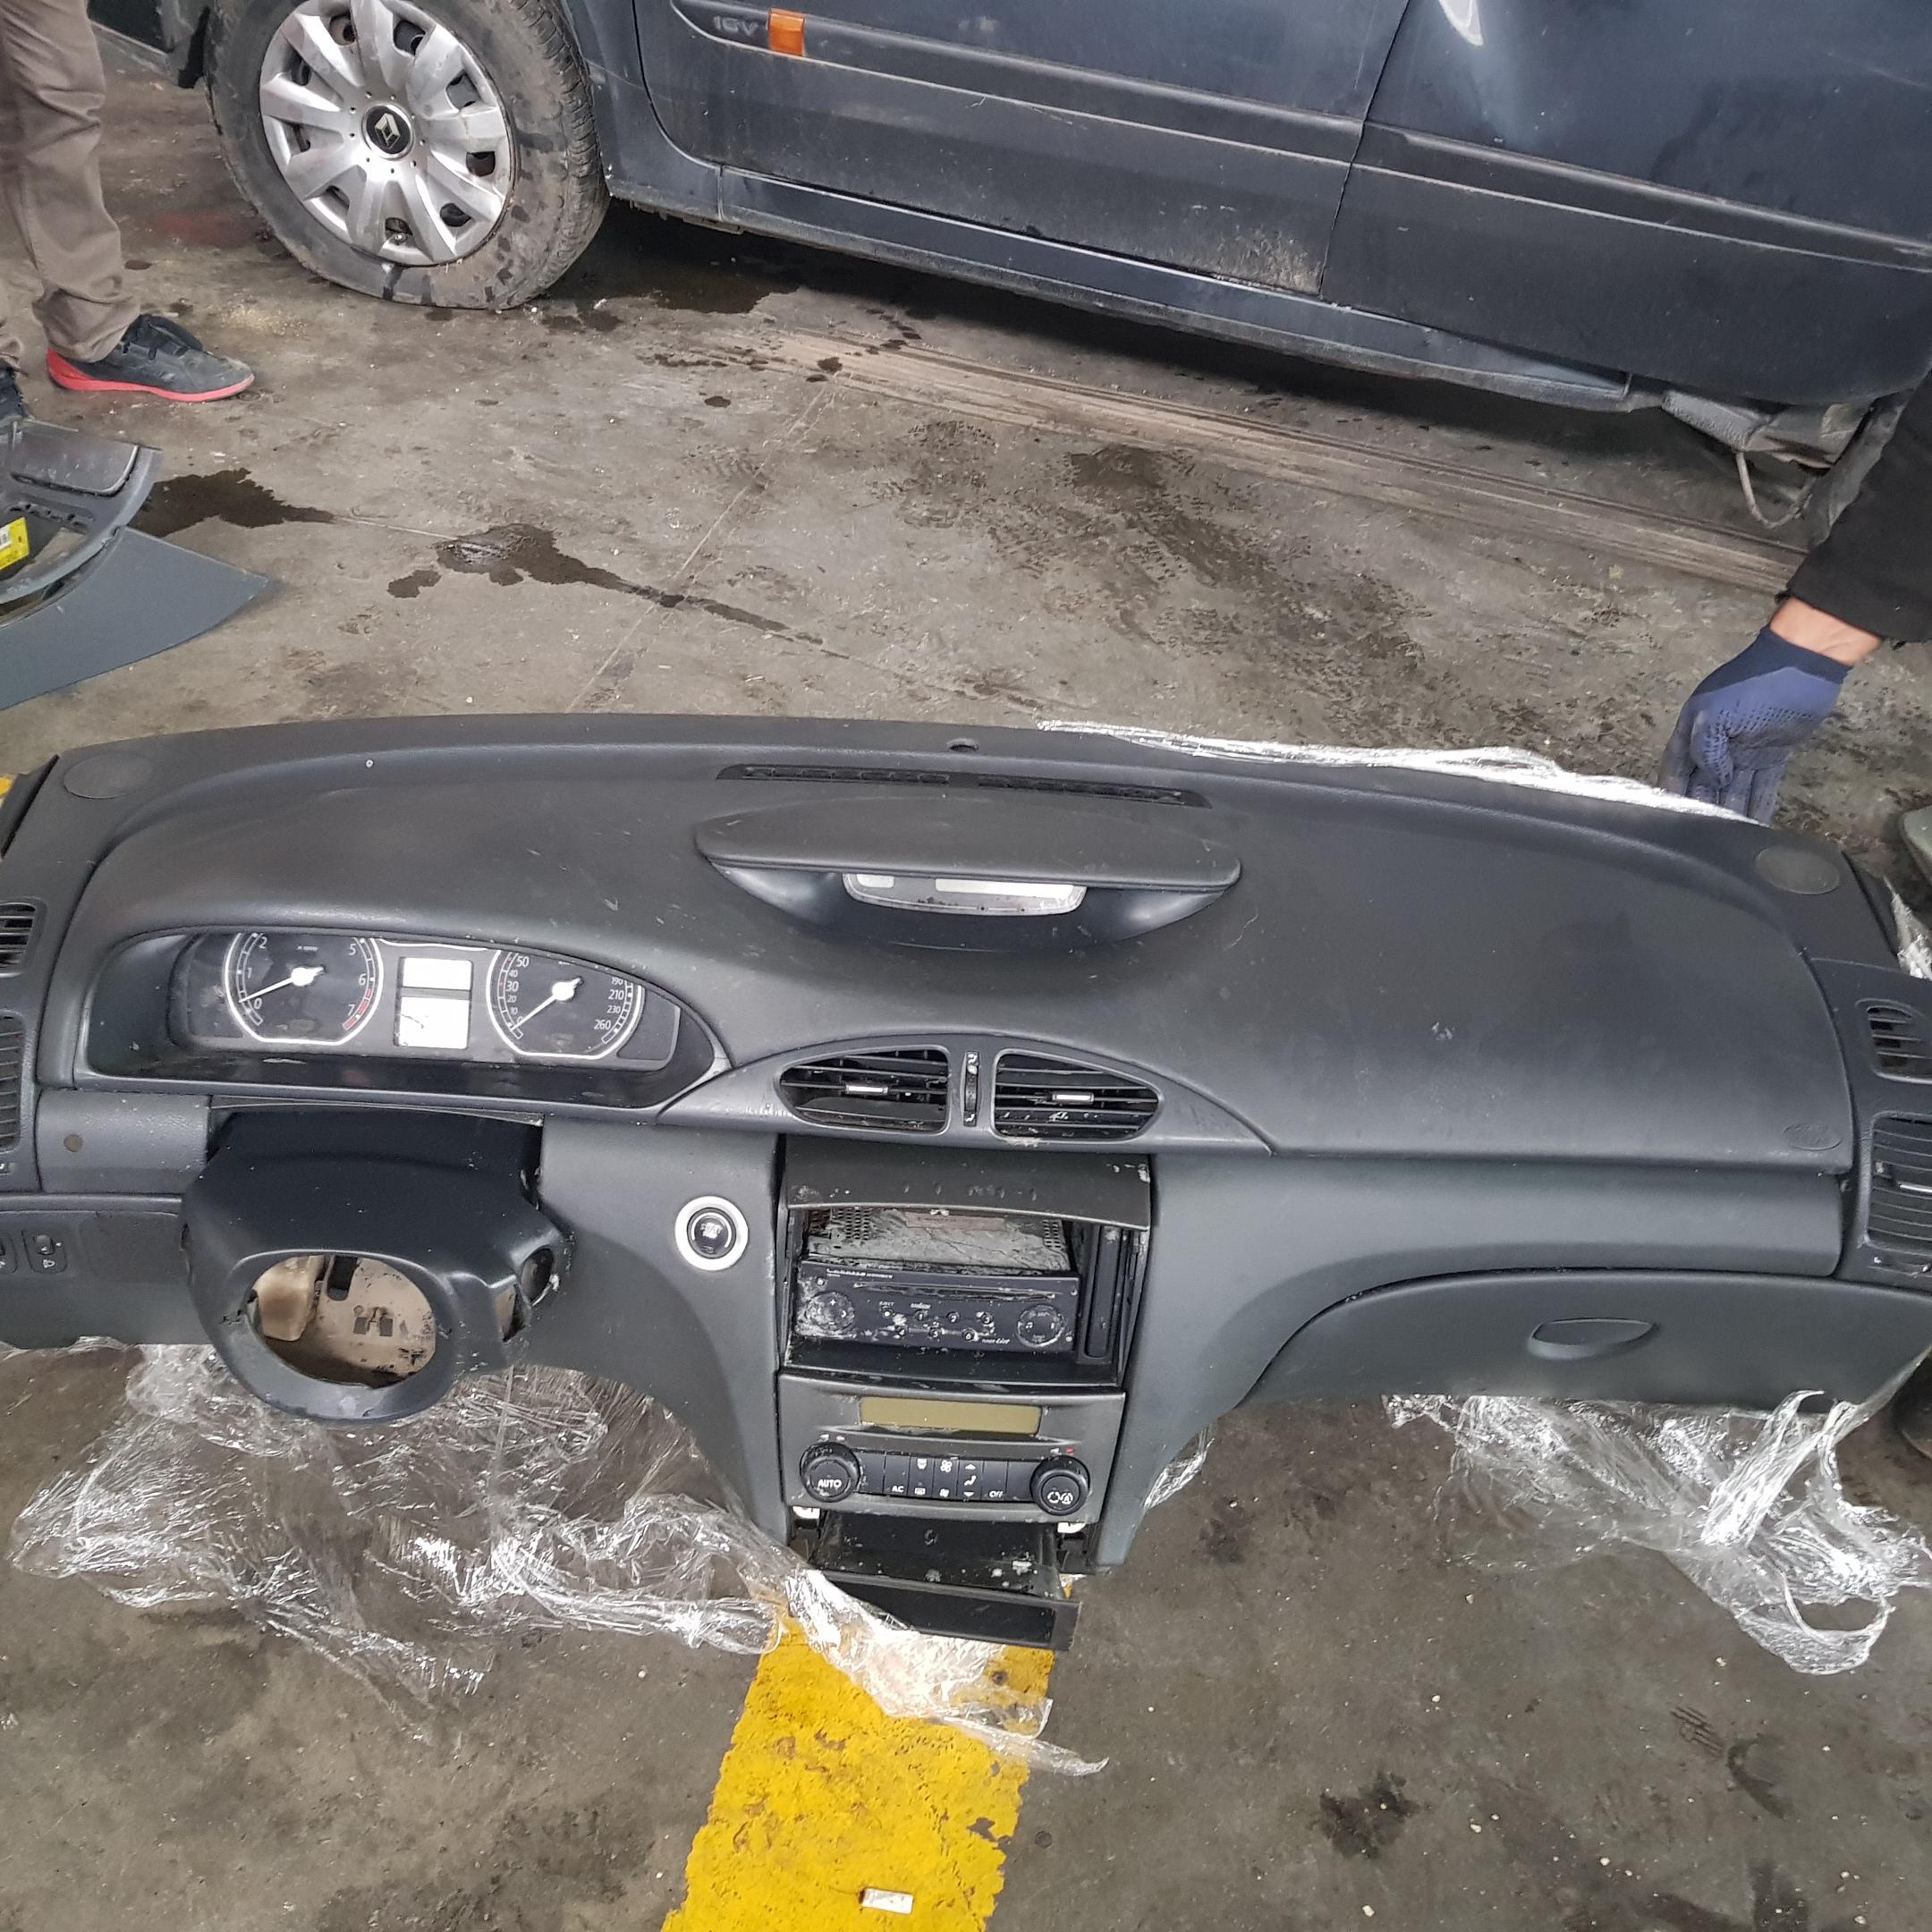 Renault Laguna 2 Cikma Gogus Turkiyenin Oto Cikma Merkezi Otocikma Com Da